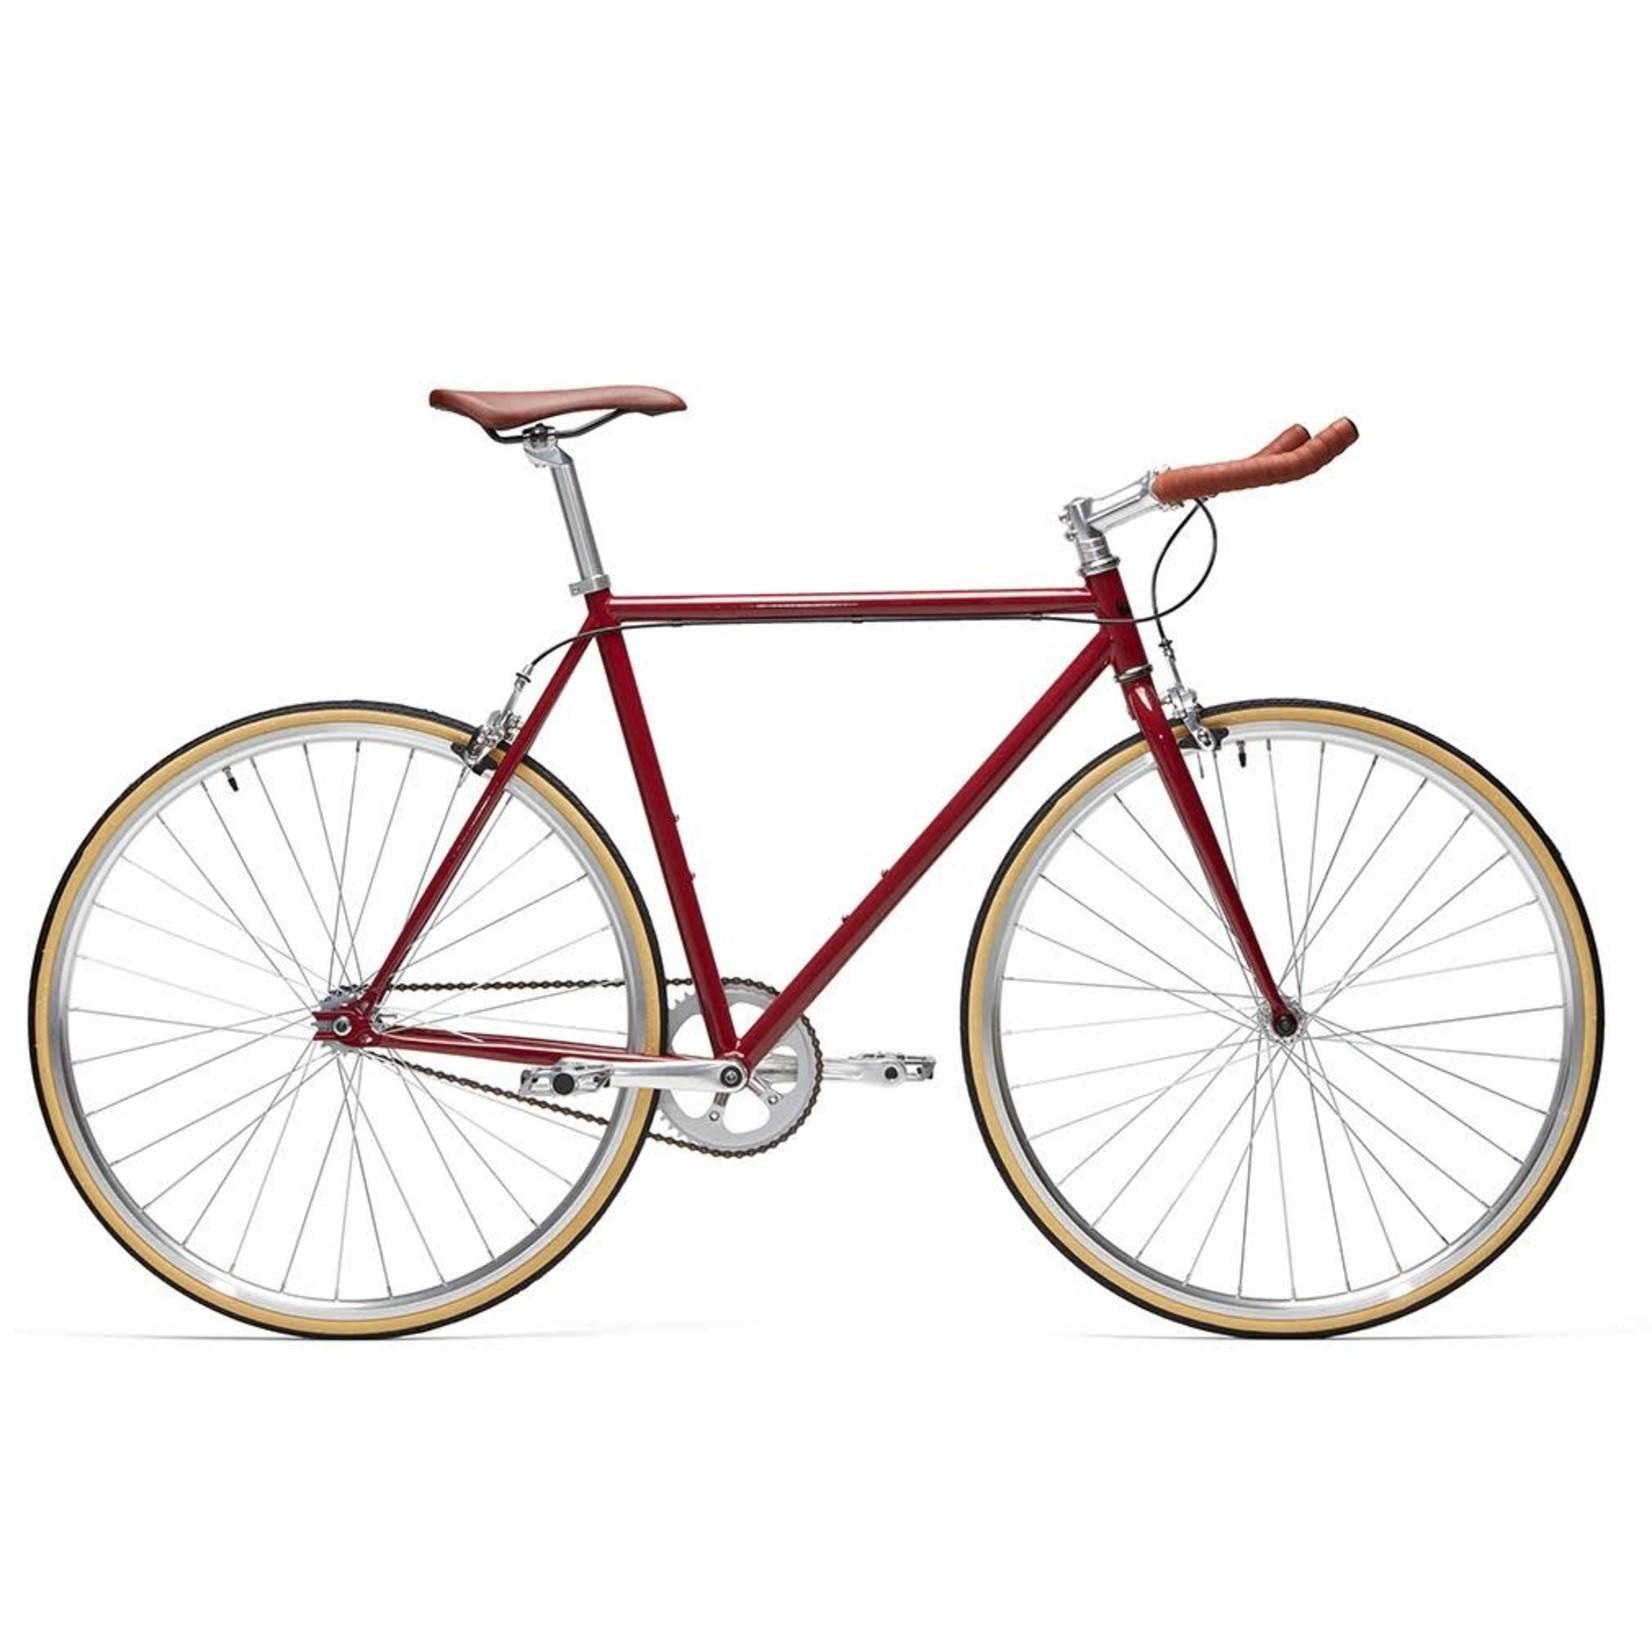 Moose Bicycle Fixie Maplewood